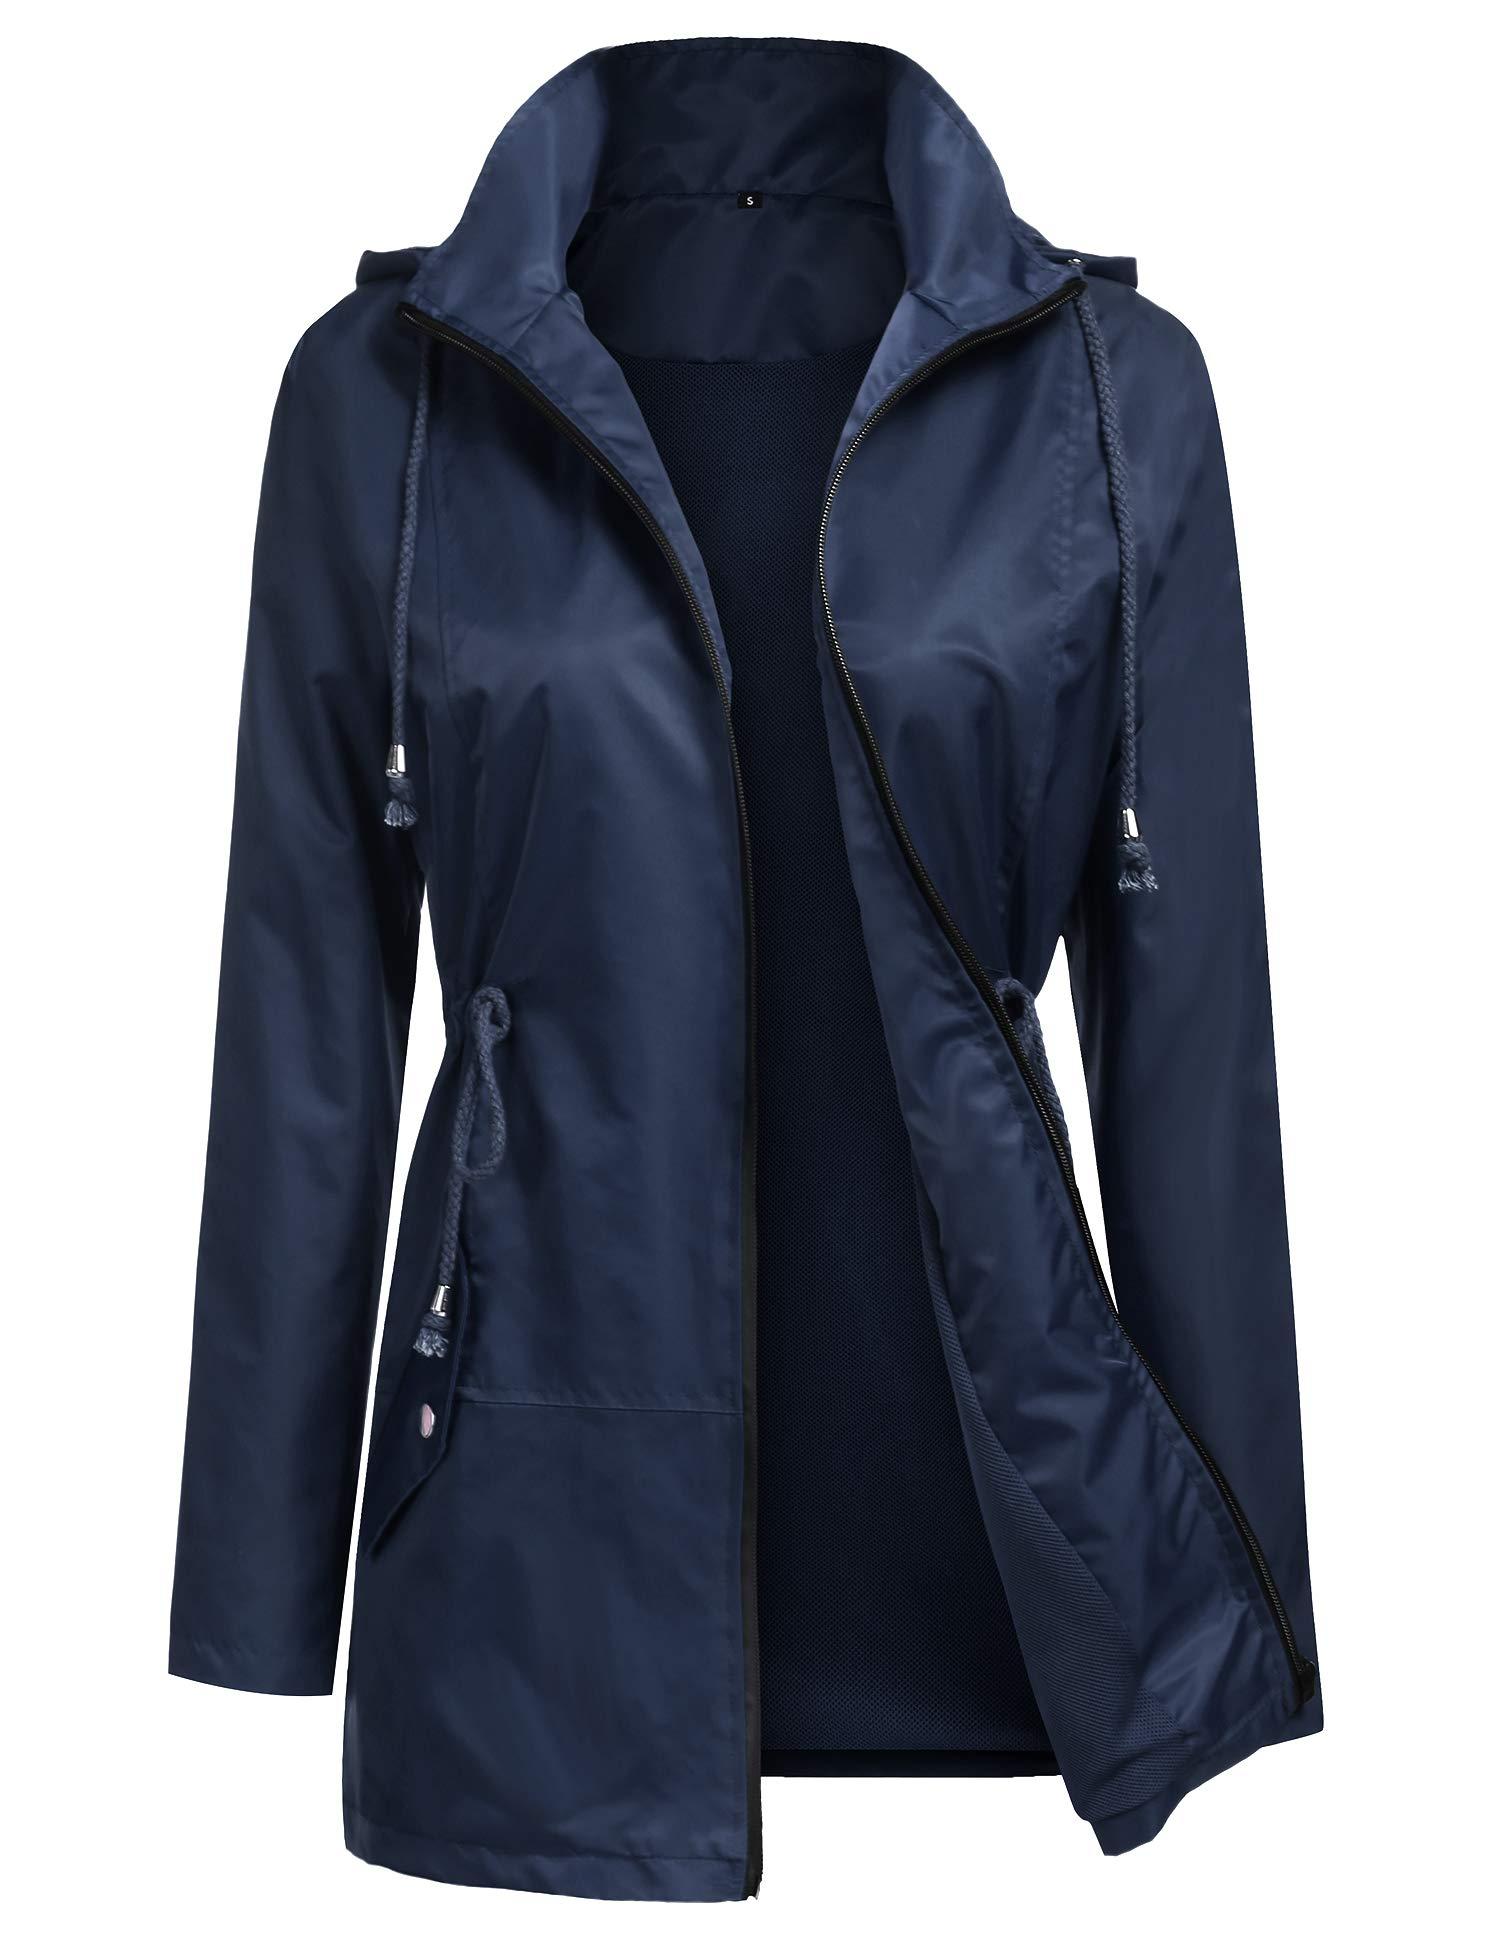 URRU Women's Lightweight Raincoats Waterproof Hoodie Outdoor Windbreaker Rain Jacket S-XXL